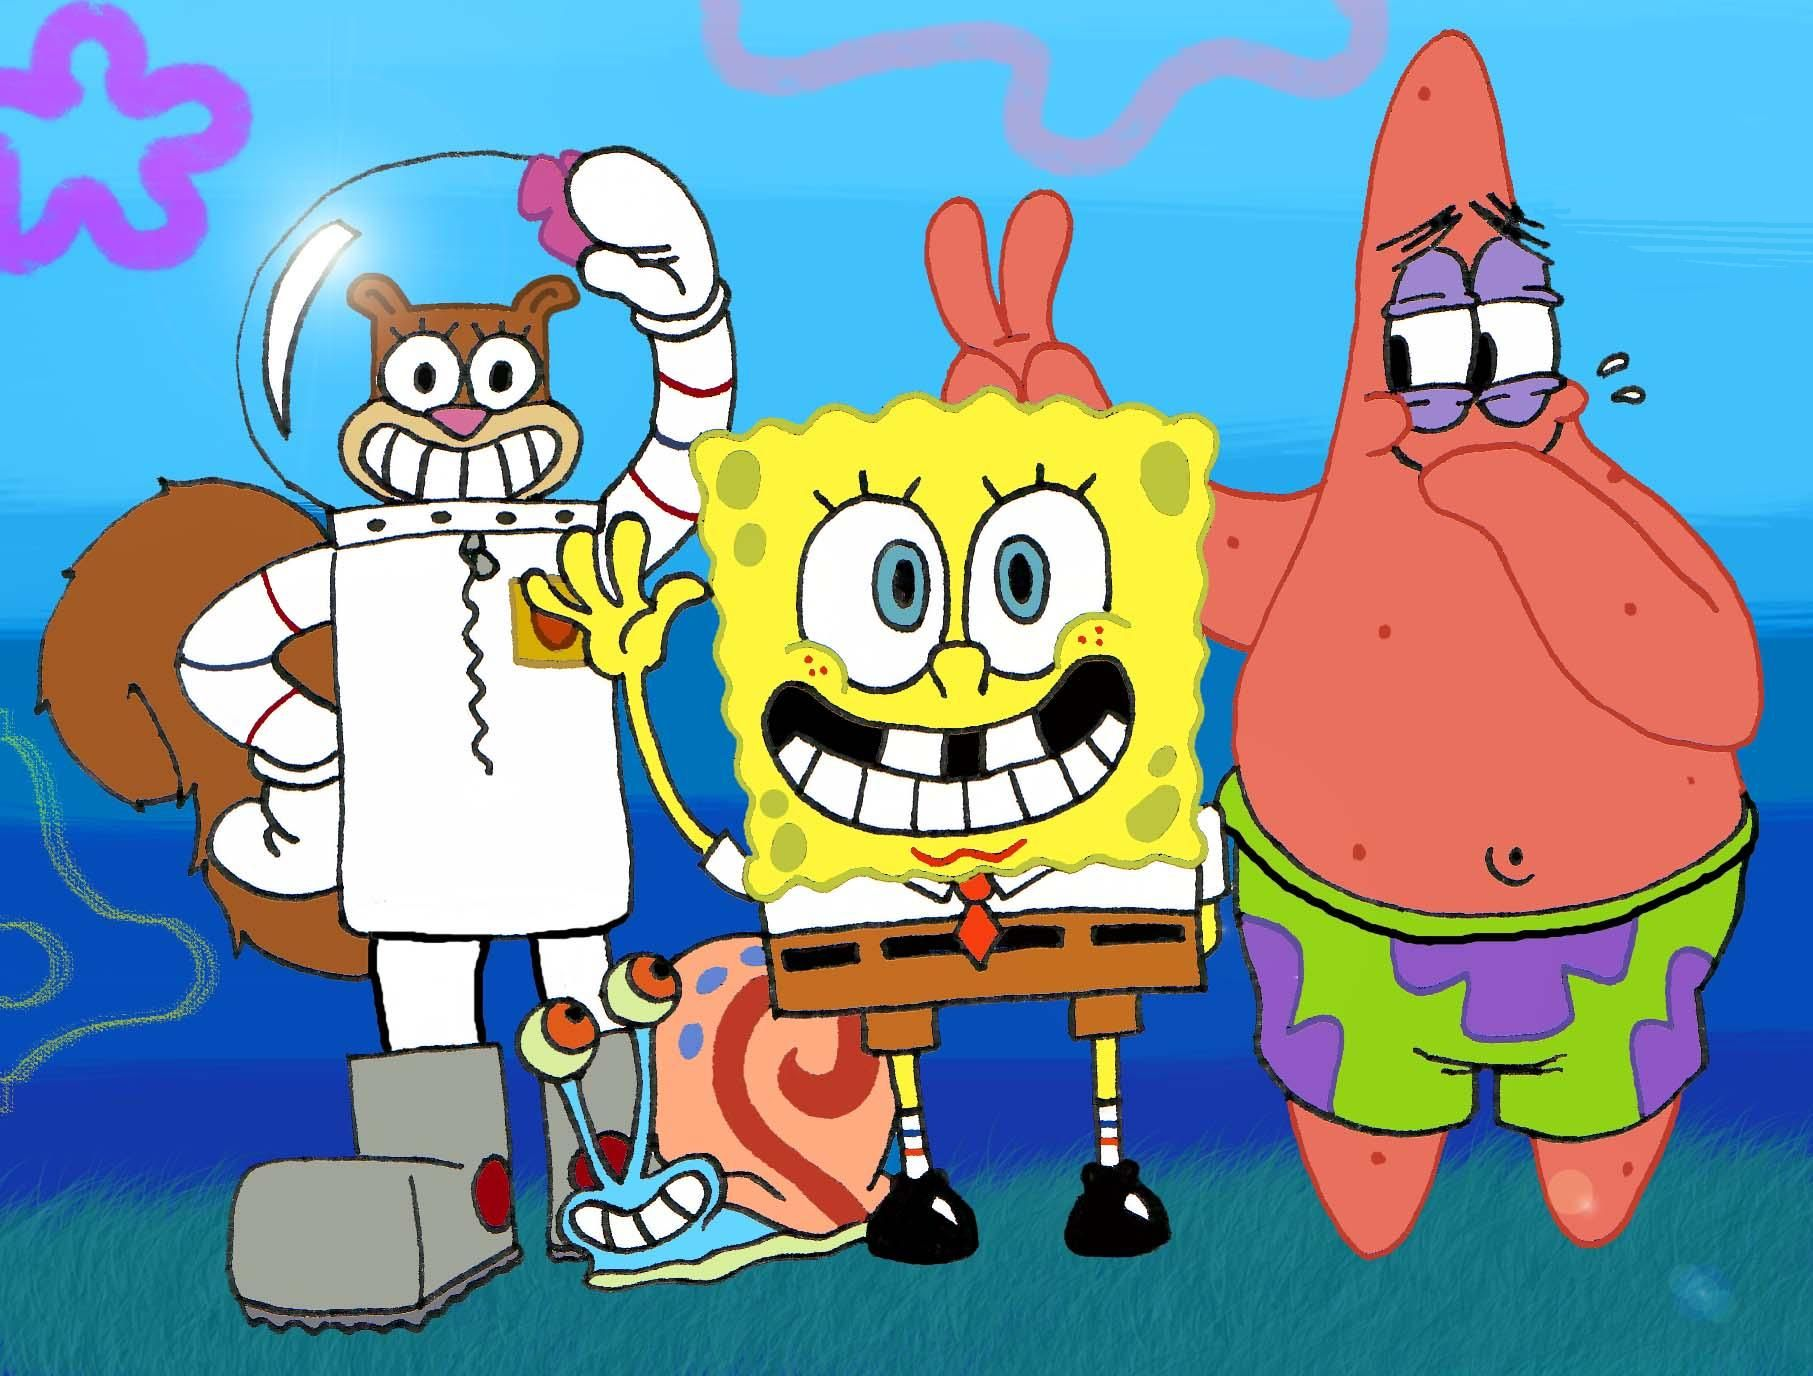 spongebob squarepants wallpaper images background 66845 ehiyo